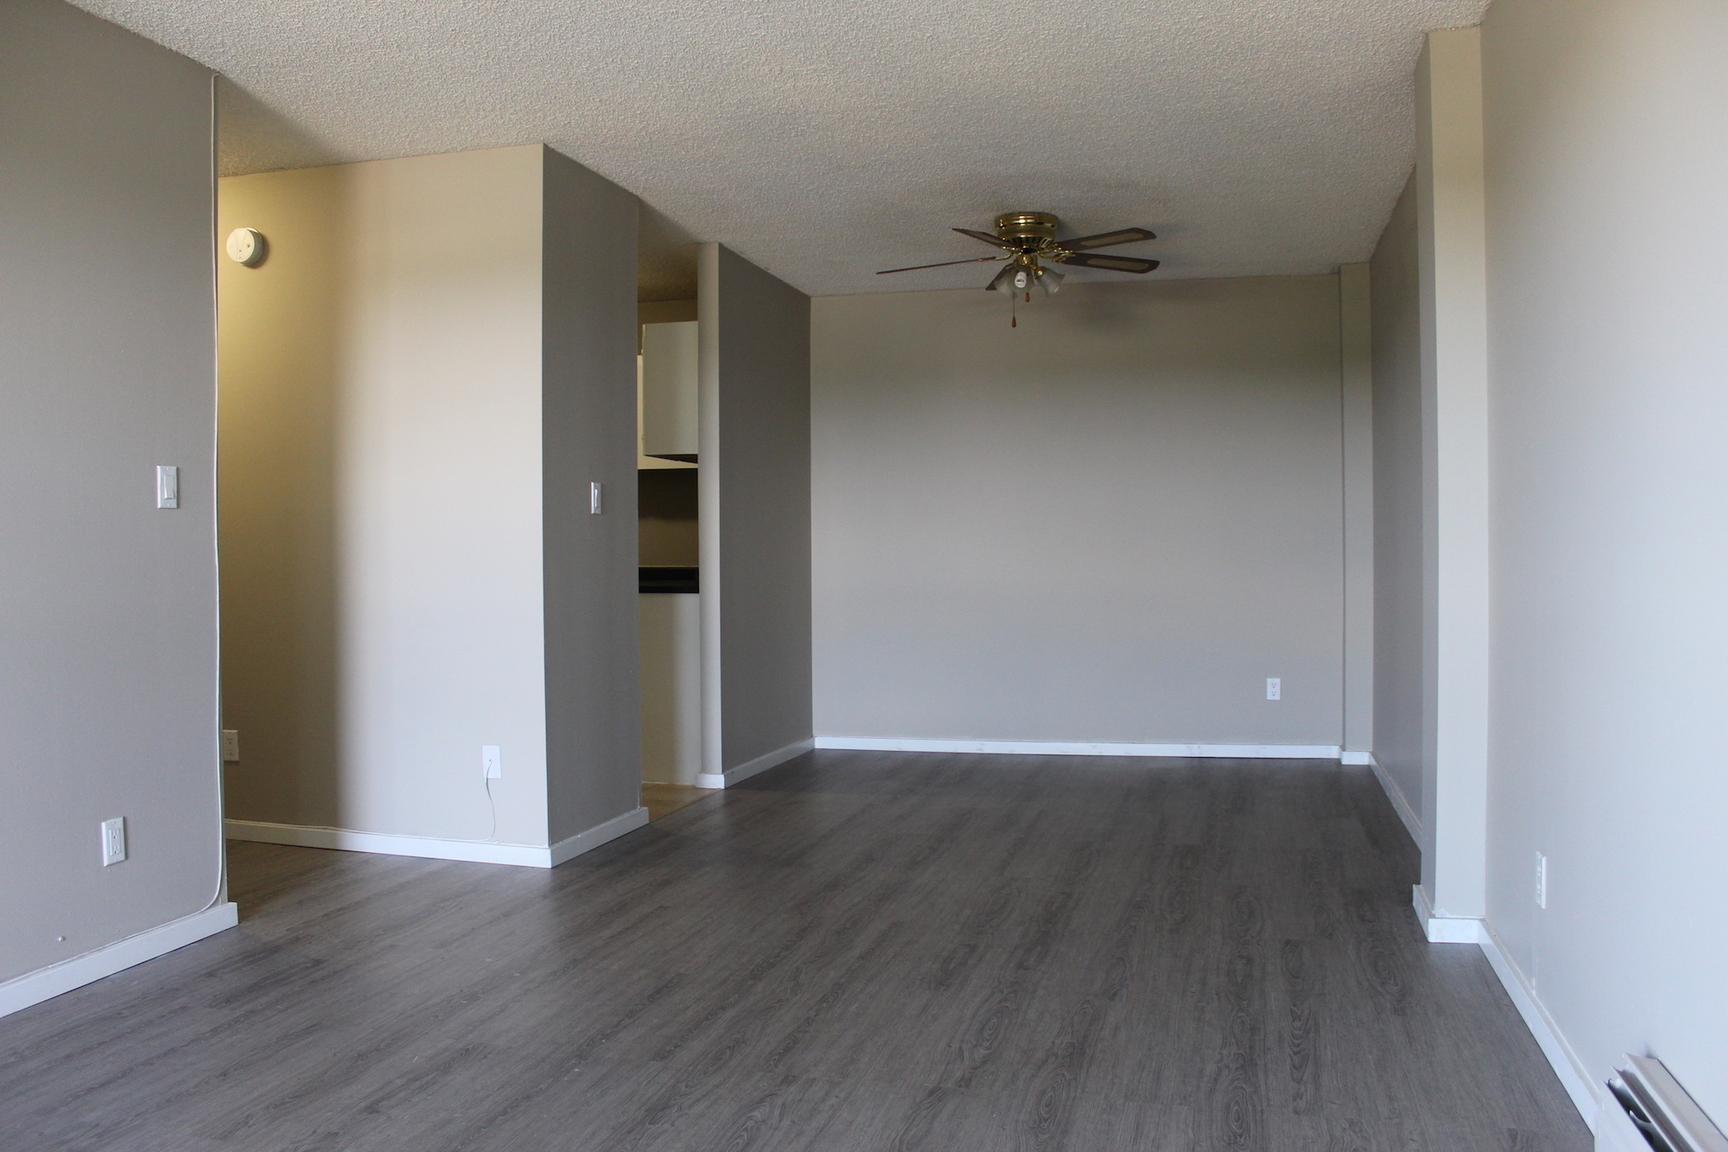 205 Heritage Drive SE, Calgary, AB - $1,025